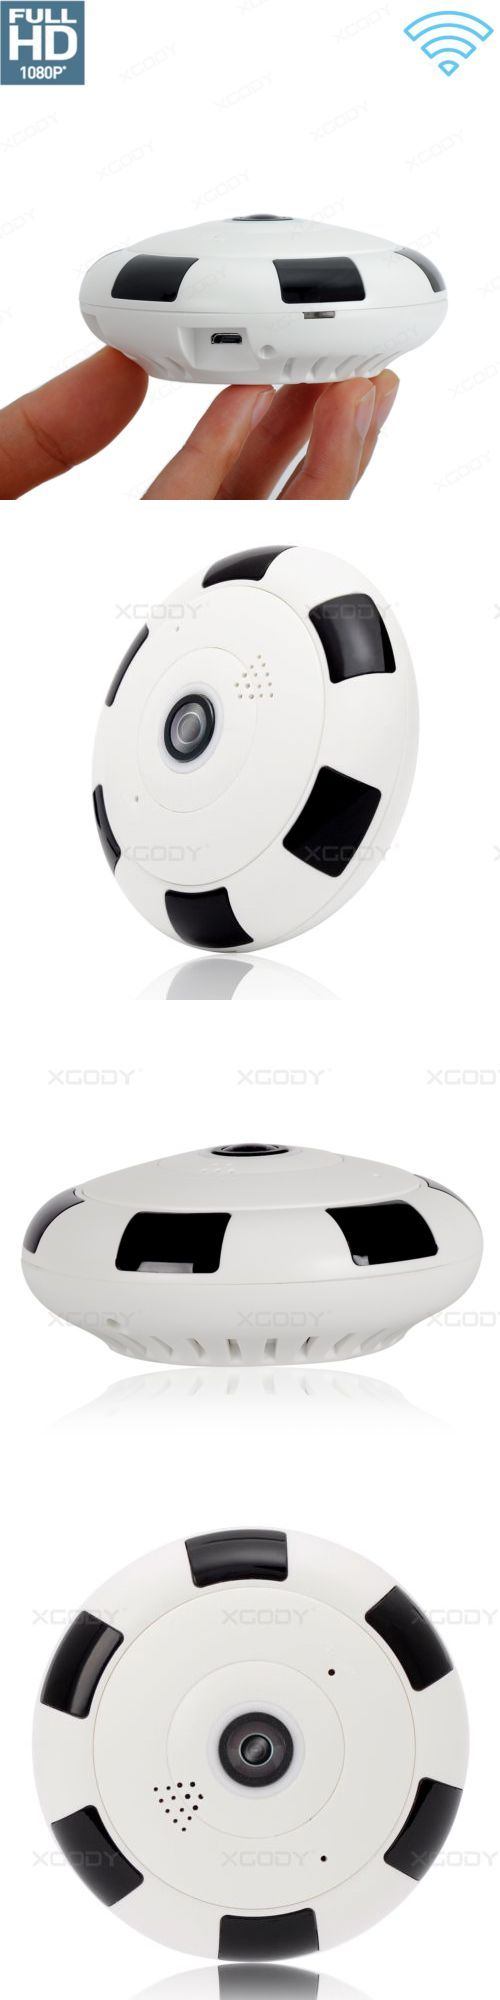 Security Cameras: Mini 360 Degree Wireless 1080P Hd Fisheye Ip Camera Two Way Audio Wifi Panoramic -> BUY IT NOW ONLY: $34.55 on eBay!